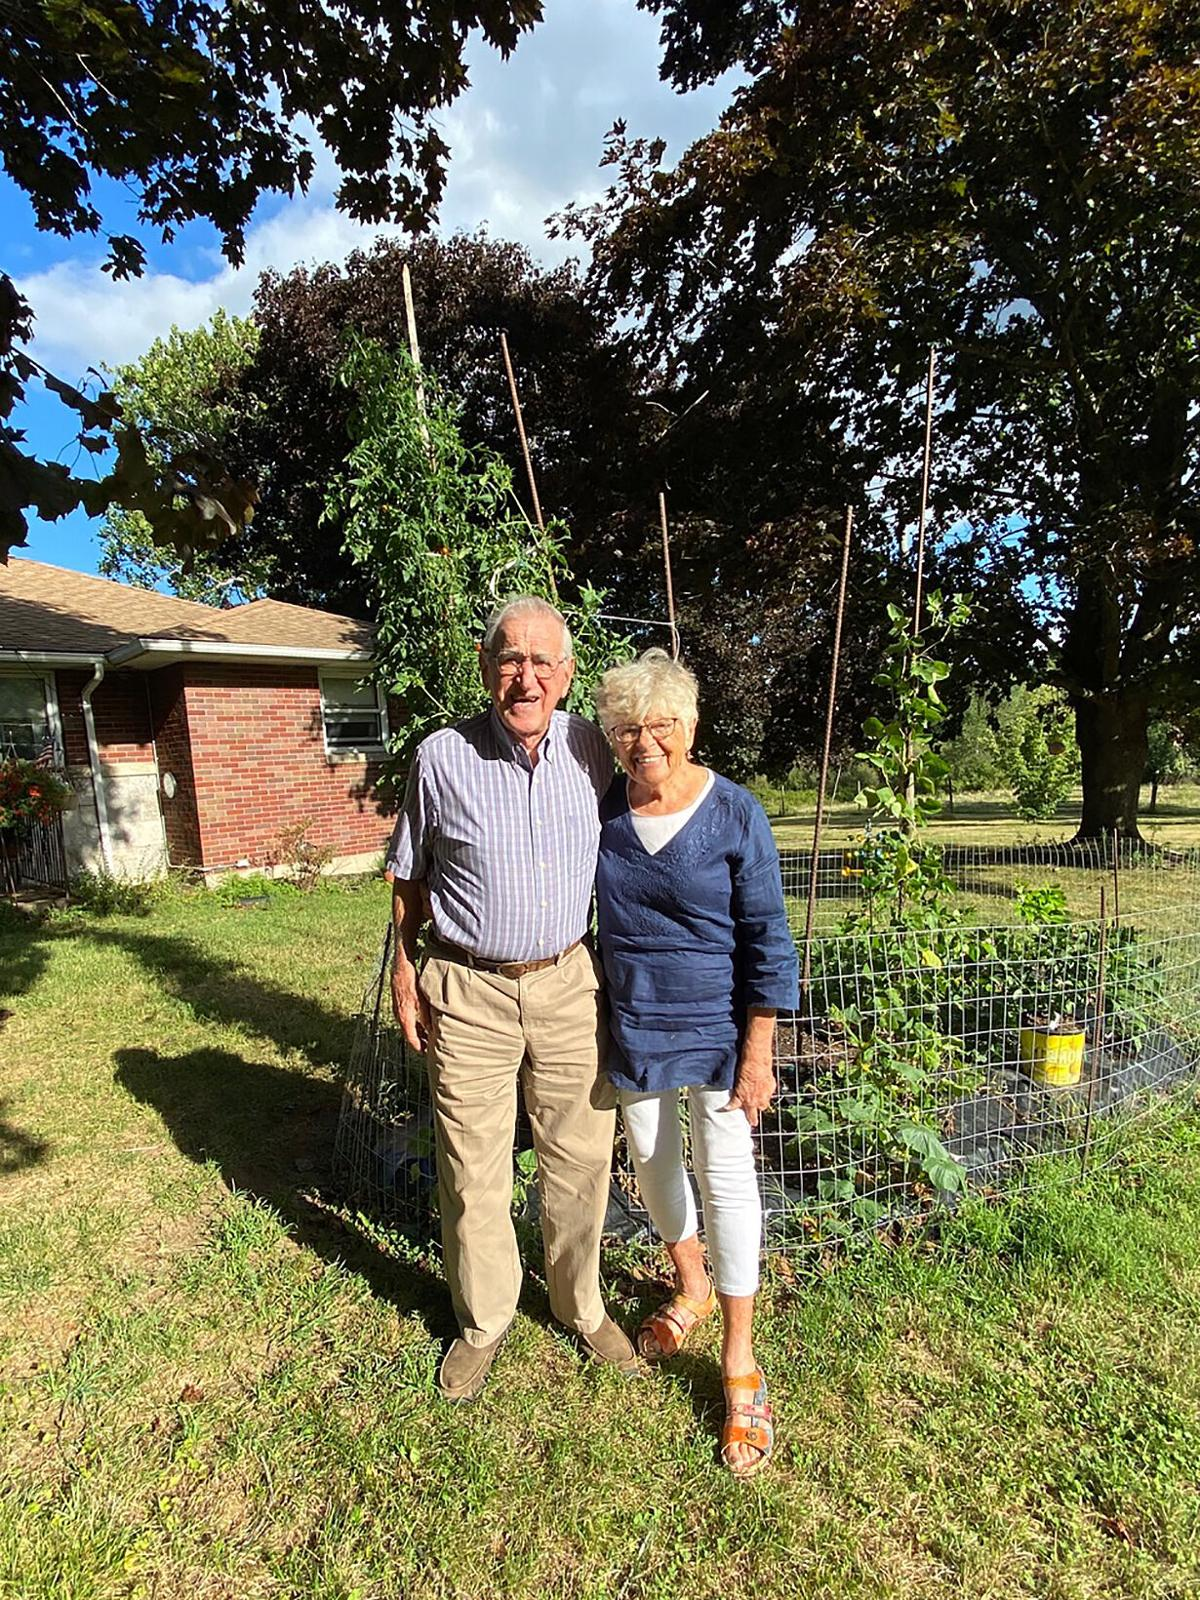 Watertown Gardeners Grow 10-Foot Tall Tomato Plants in Backyard